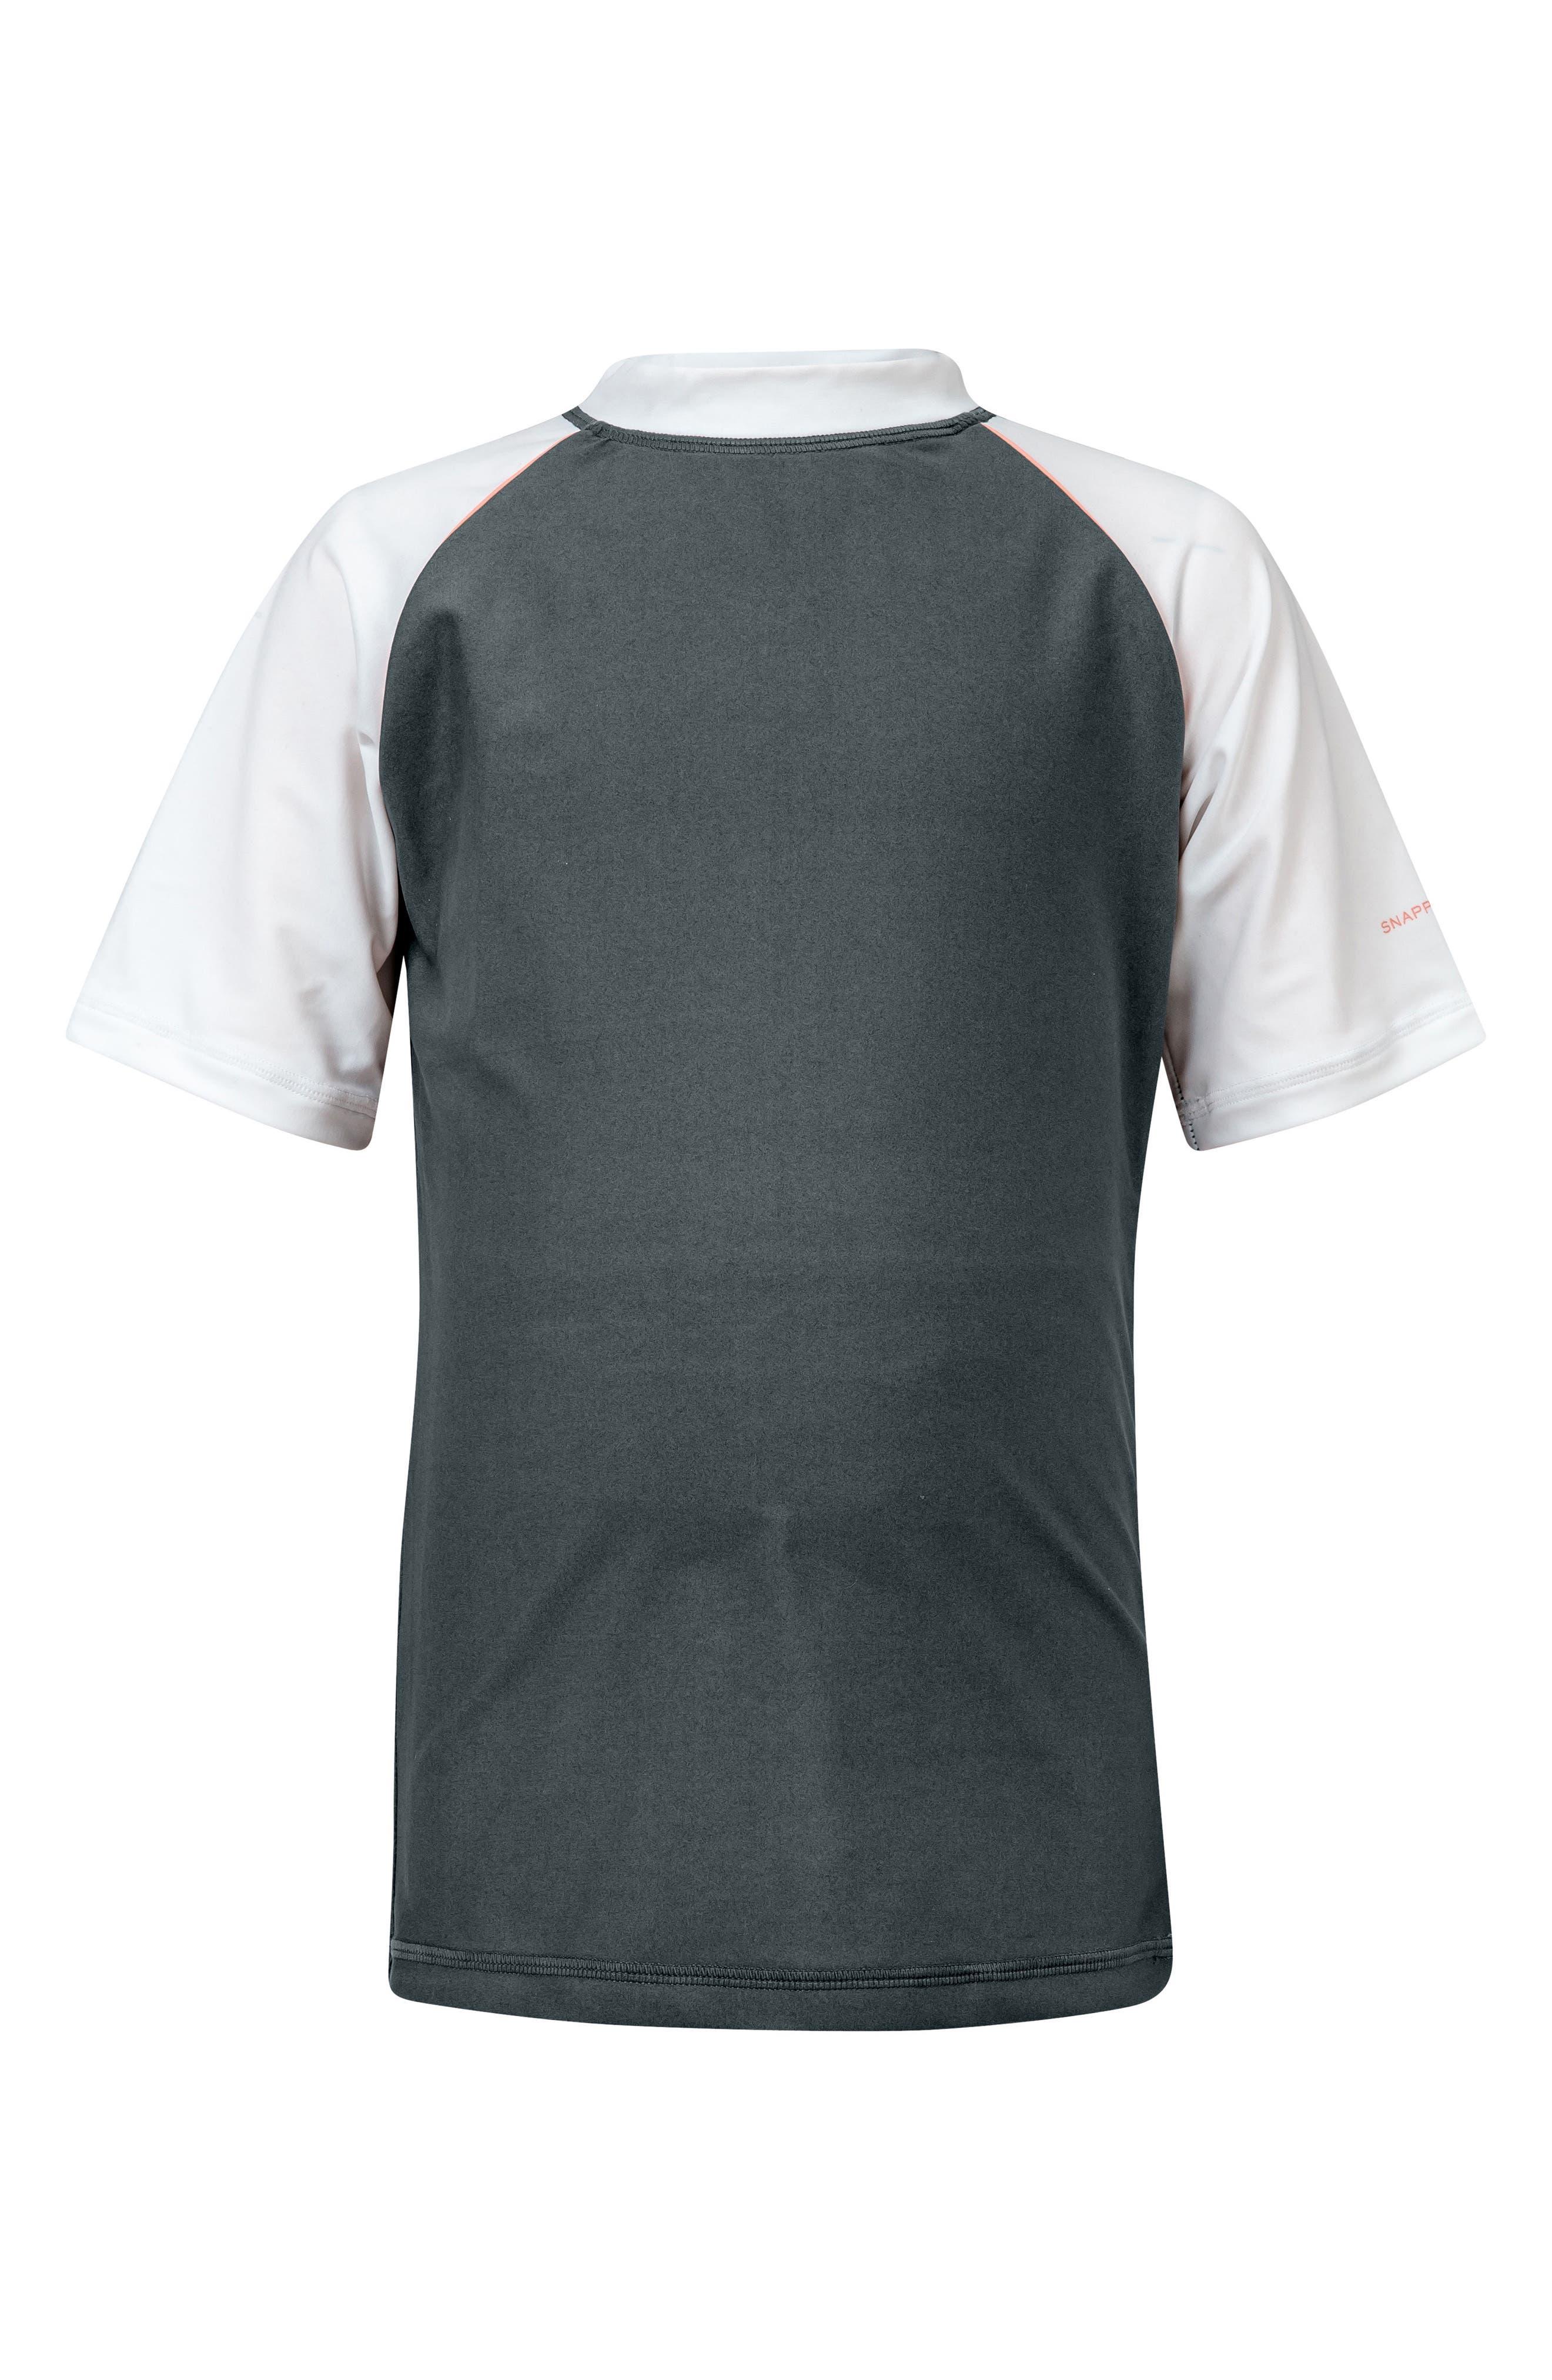 Raglan Short Sleeve Rashguard,                             Main thumbnail 1, color,                             STEEL GREY